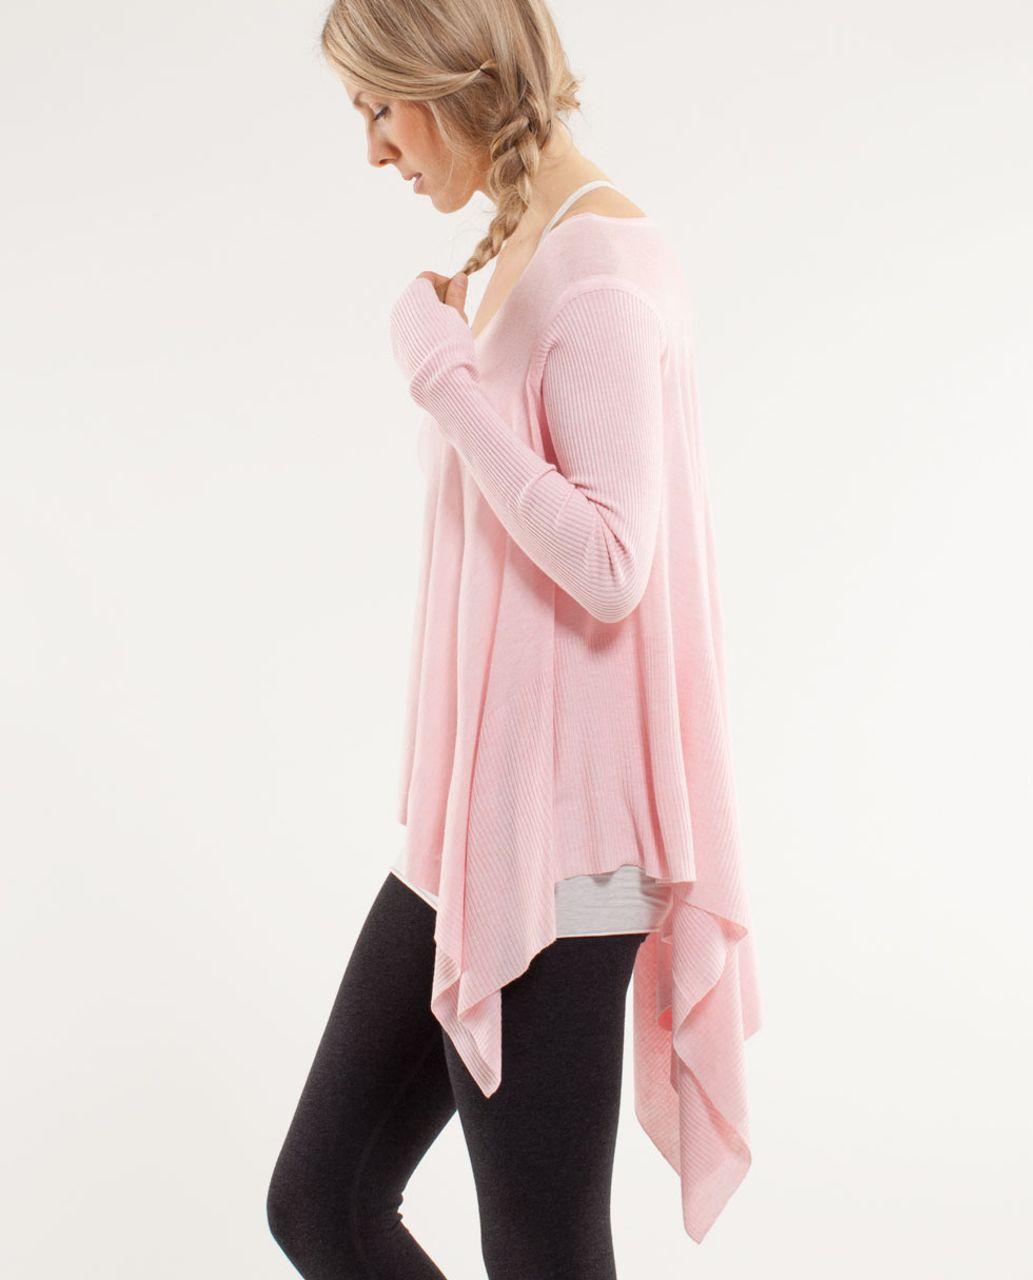 Lululemon Enlightened Pullover - Heathered Blush Quartz